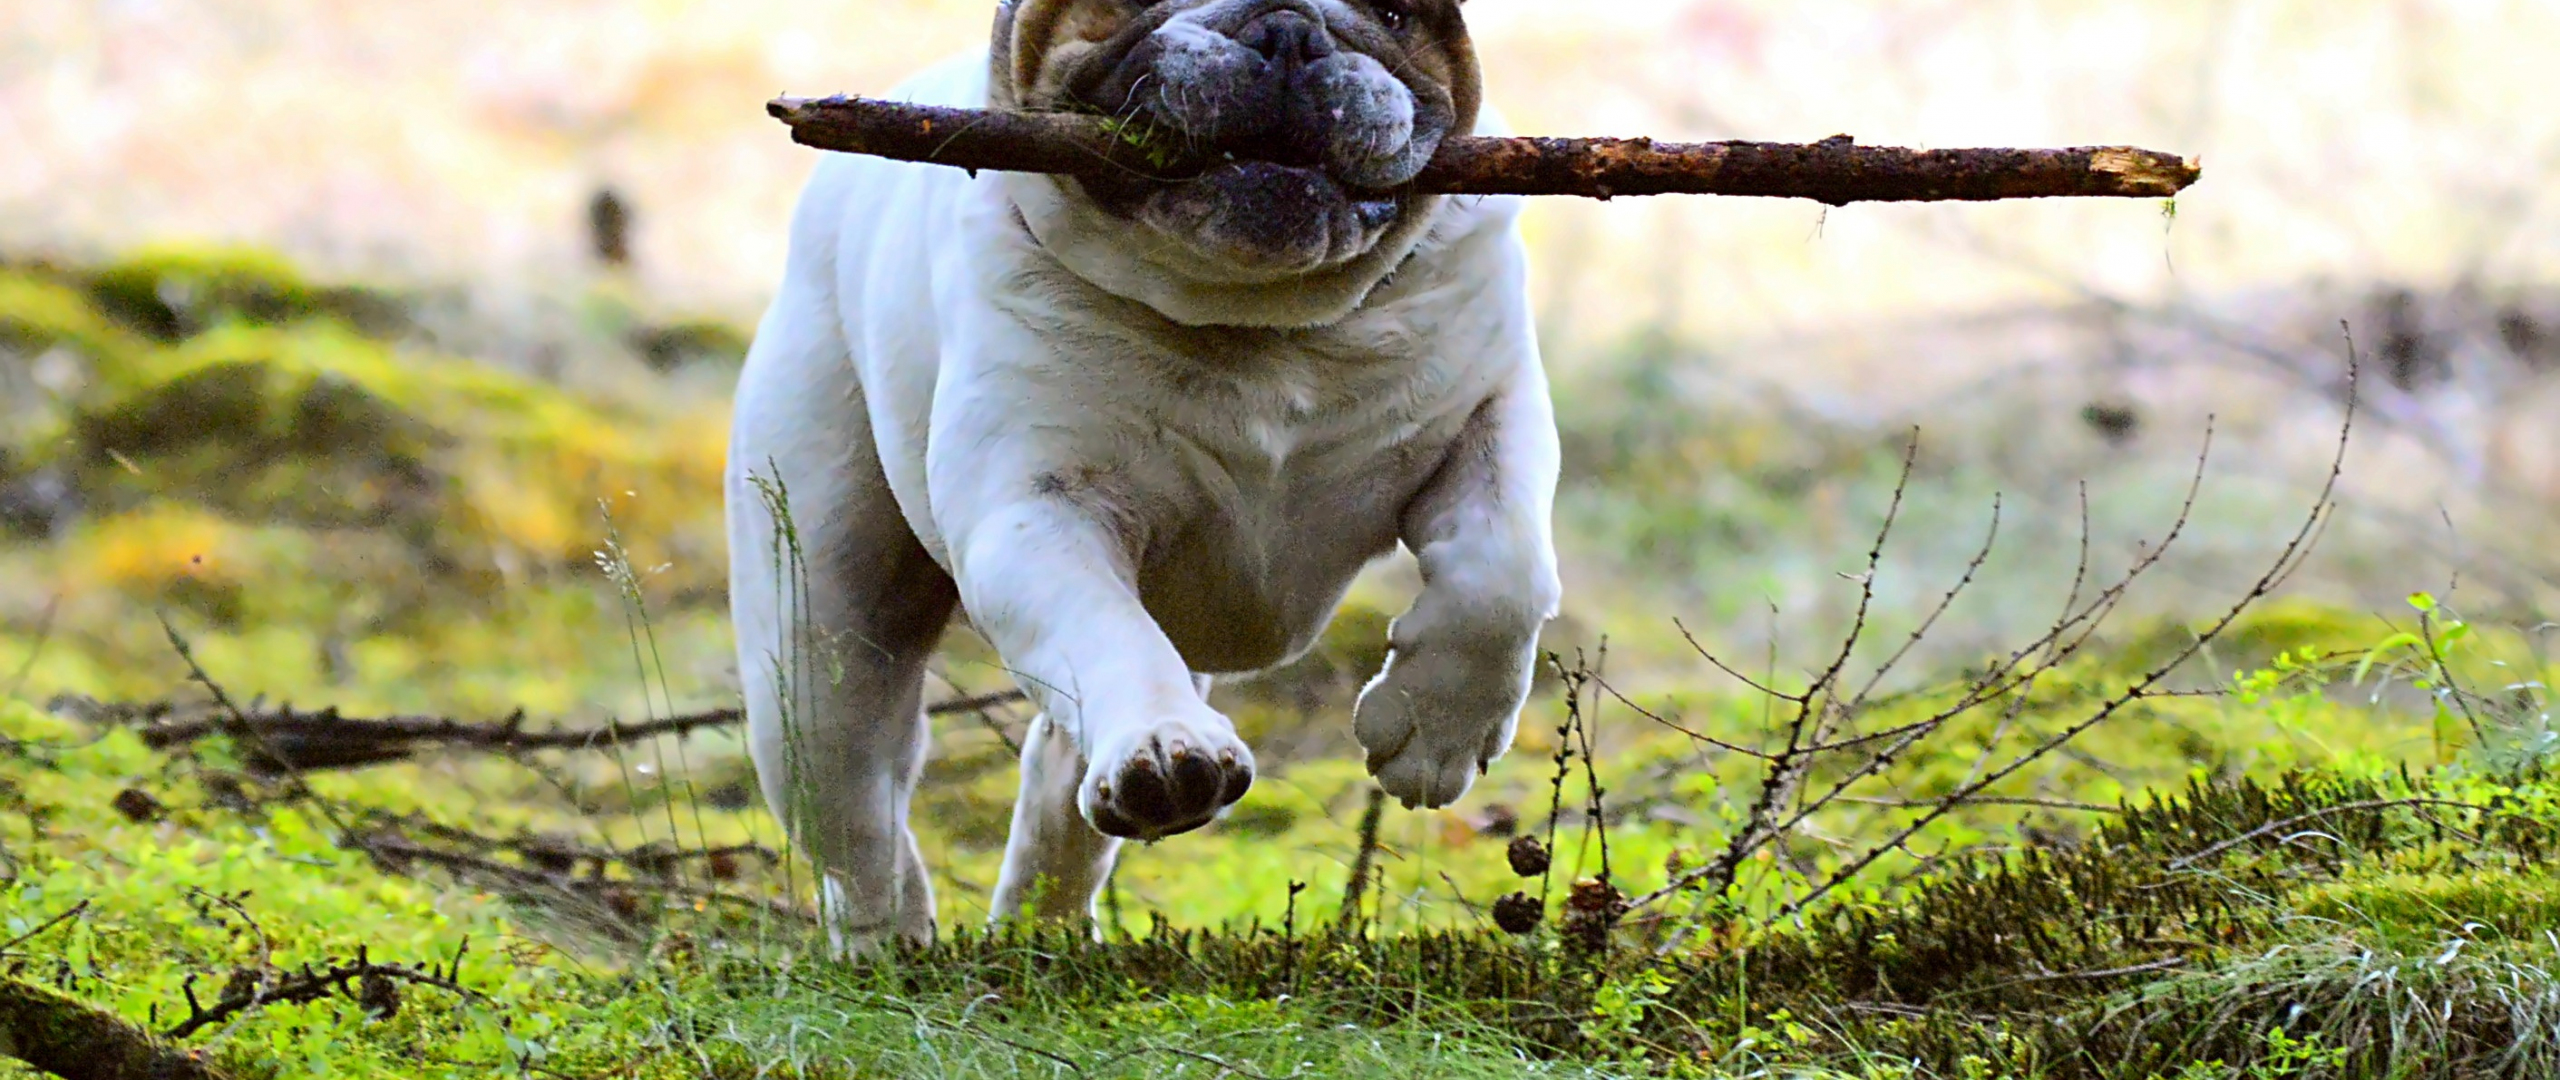 2560x1080 wallpaper Dog, pet bulldog, run, play